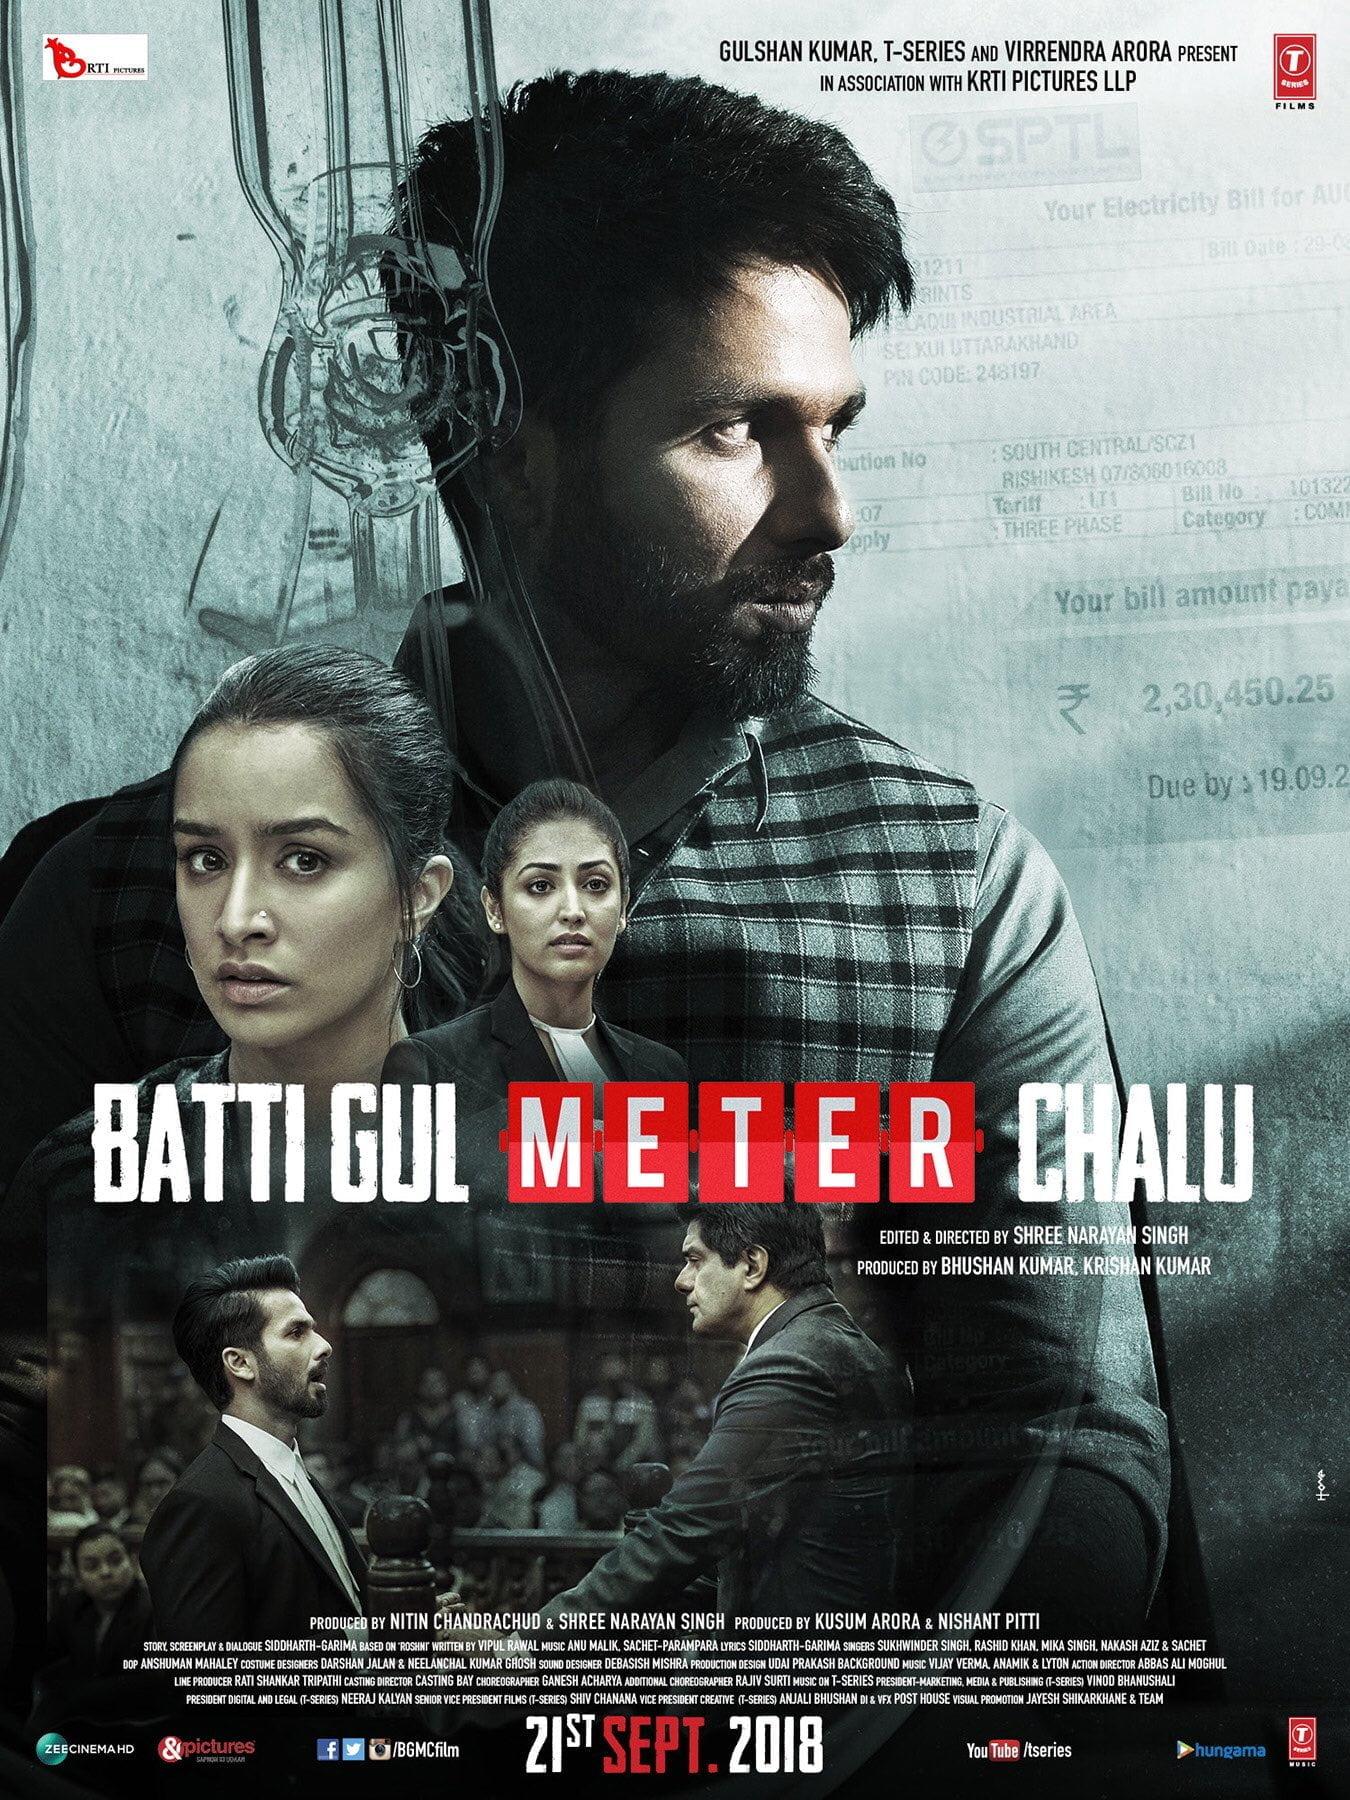 Batti Gul Meter Chalu Lifetime Box Office Collection Daywise Worldwide